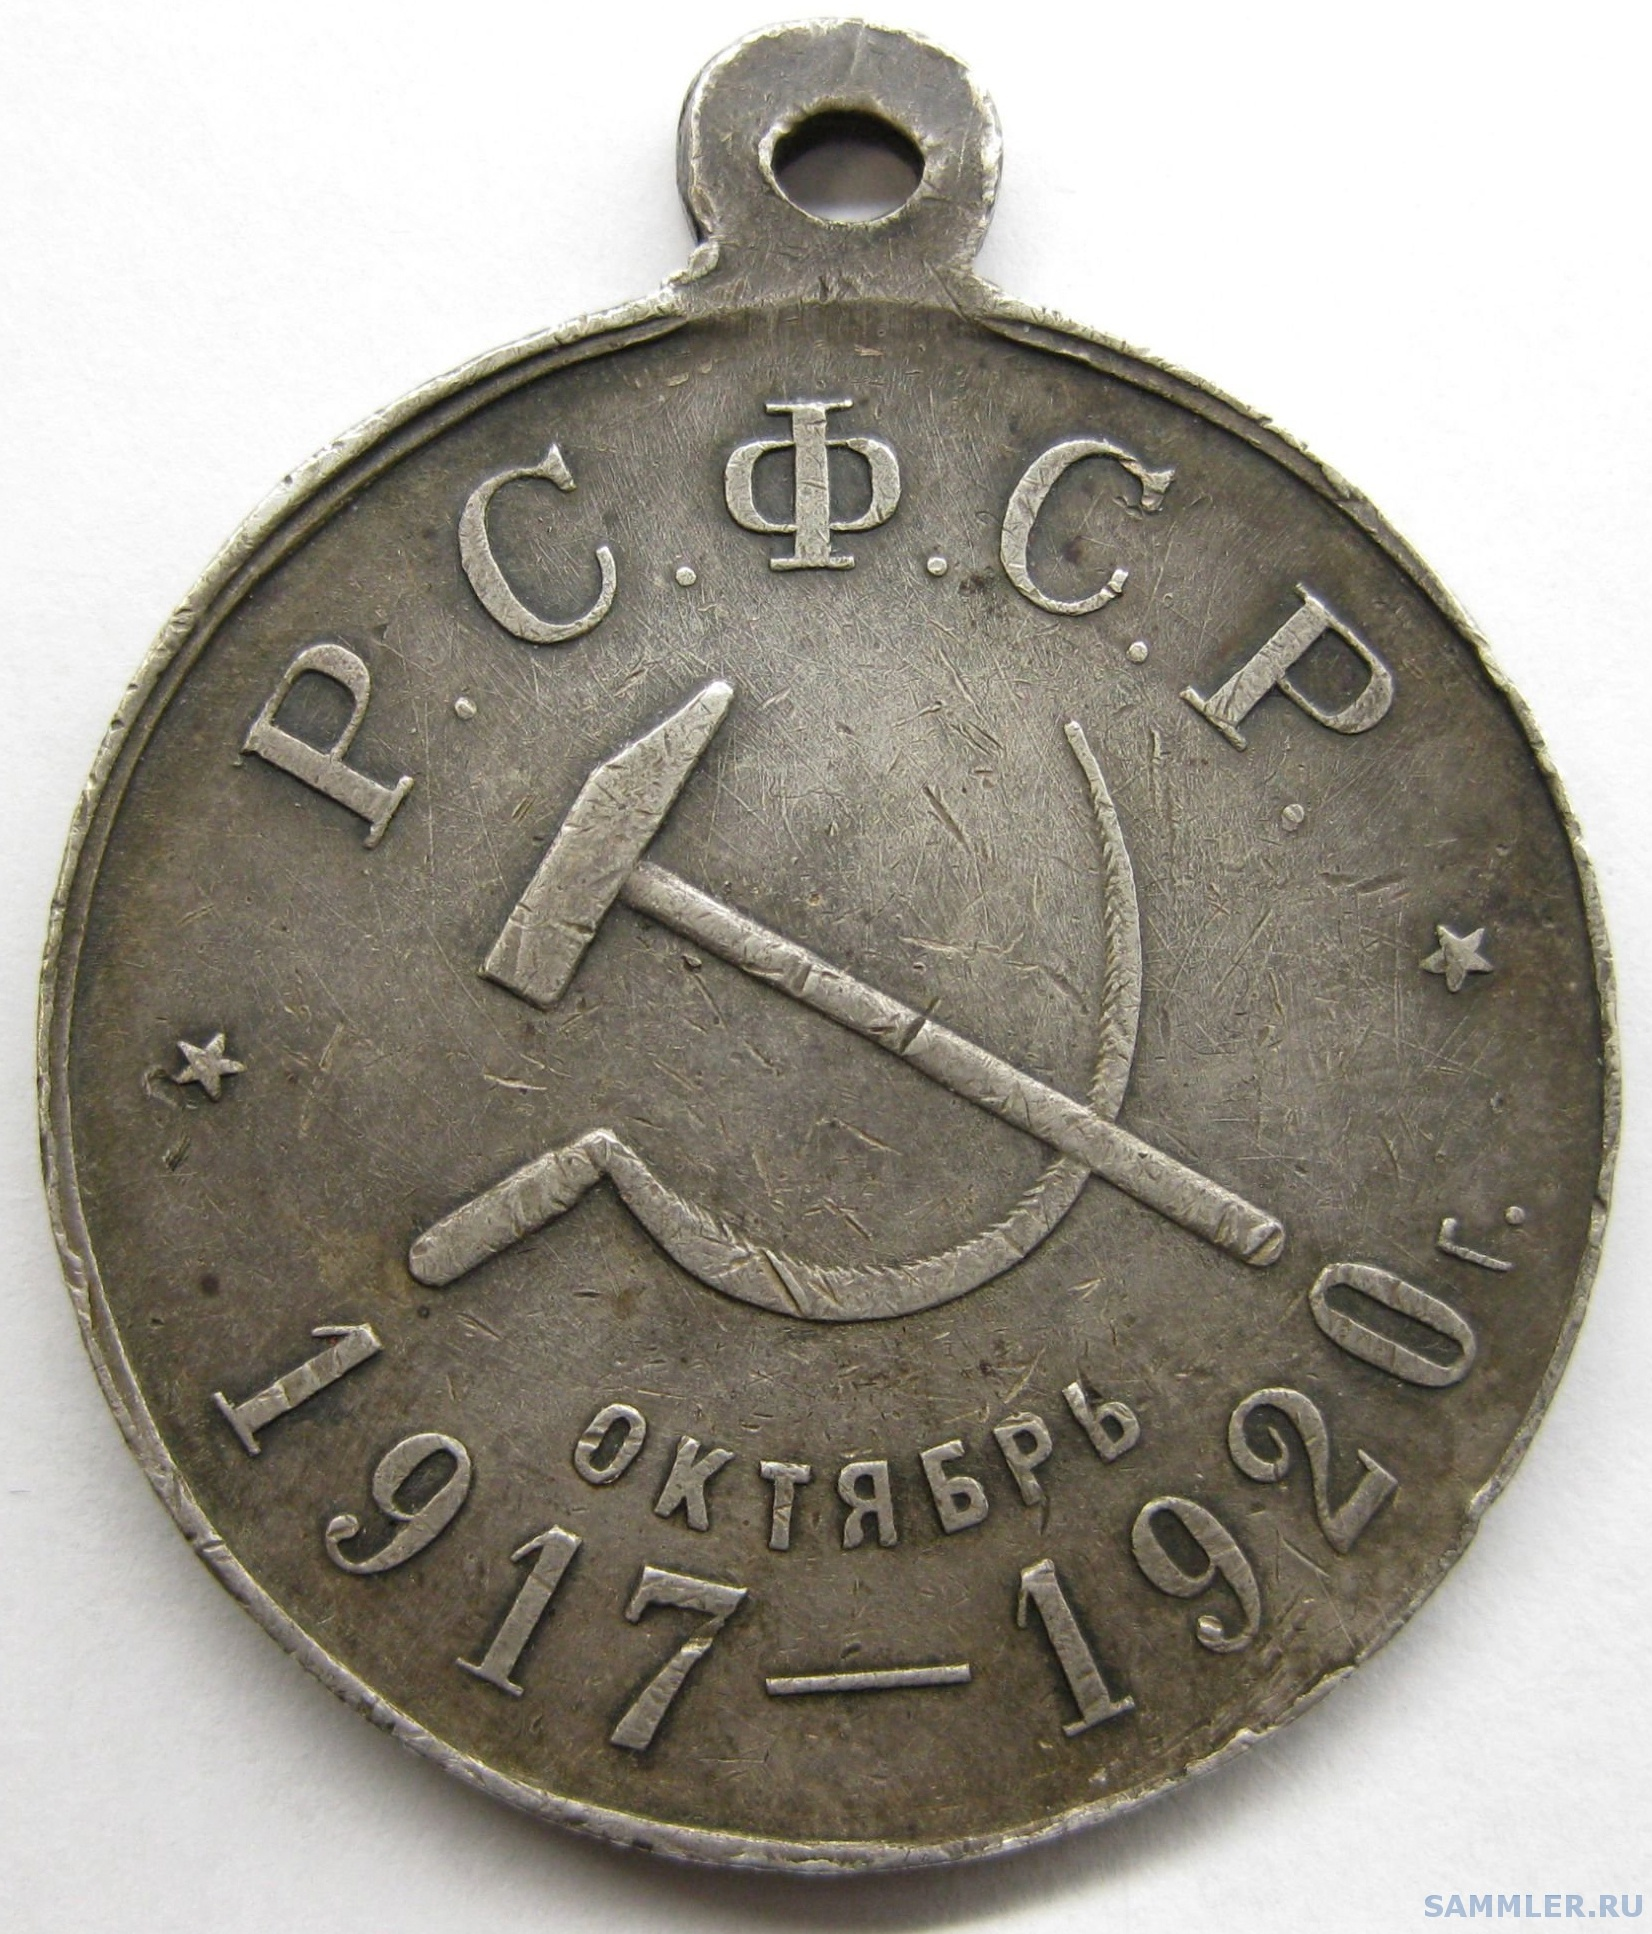 Медаль 3 года ВОР РСФСР октябрь 1917-1920, Серебро.jpg